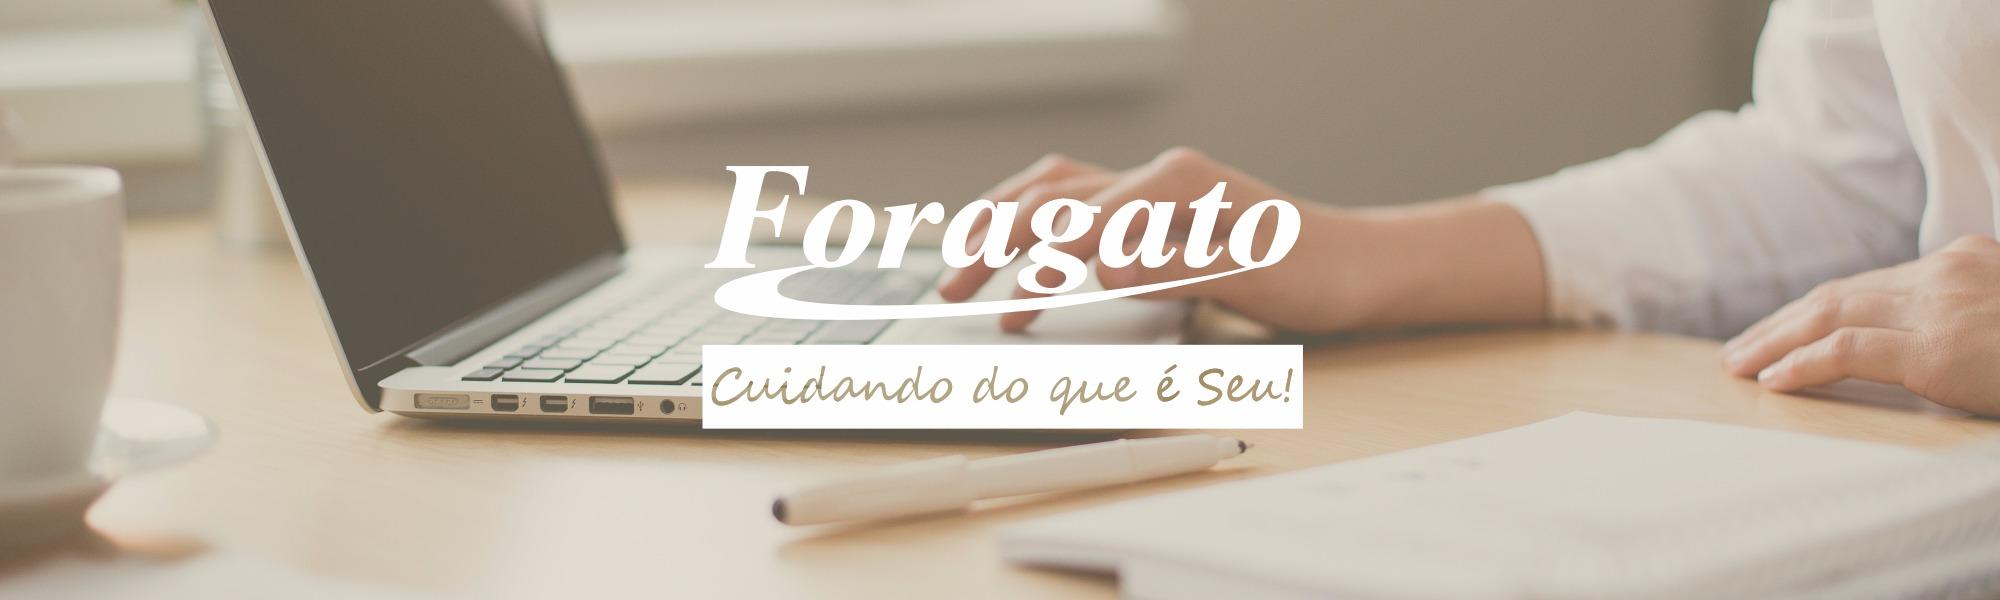 Grupo Foragato